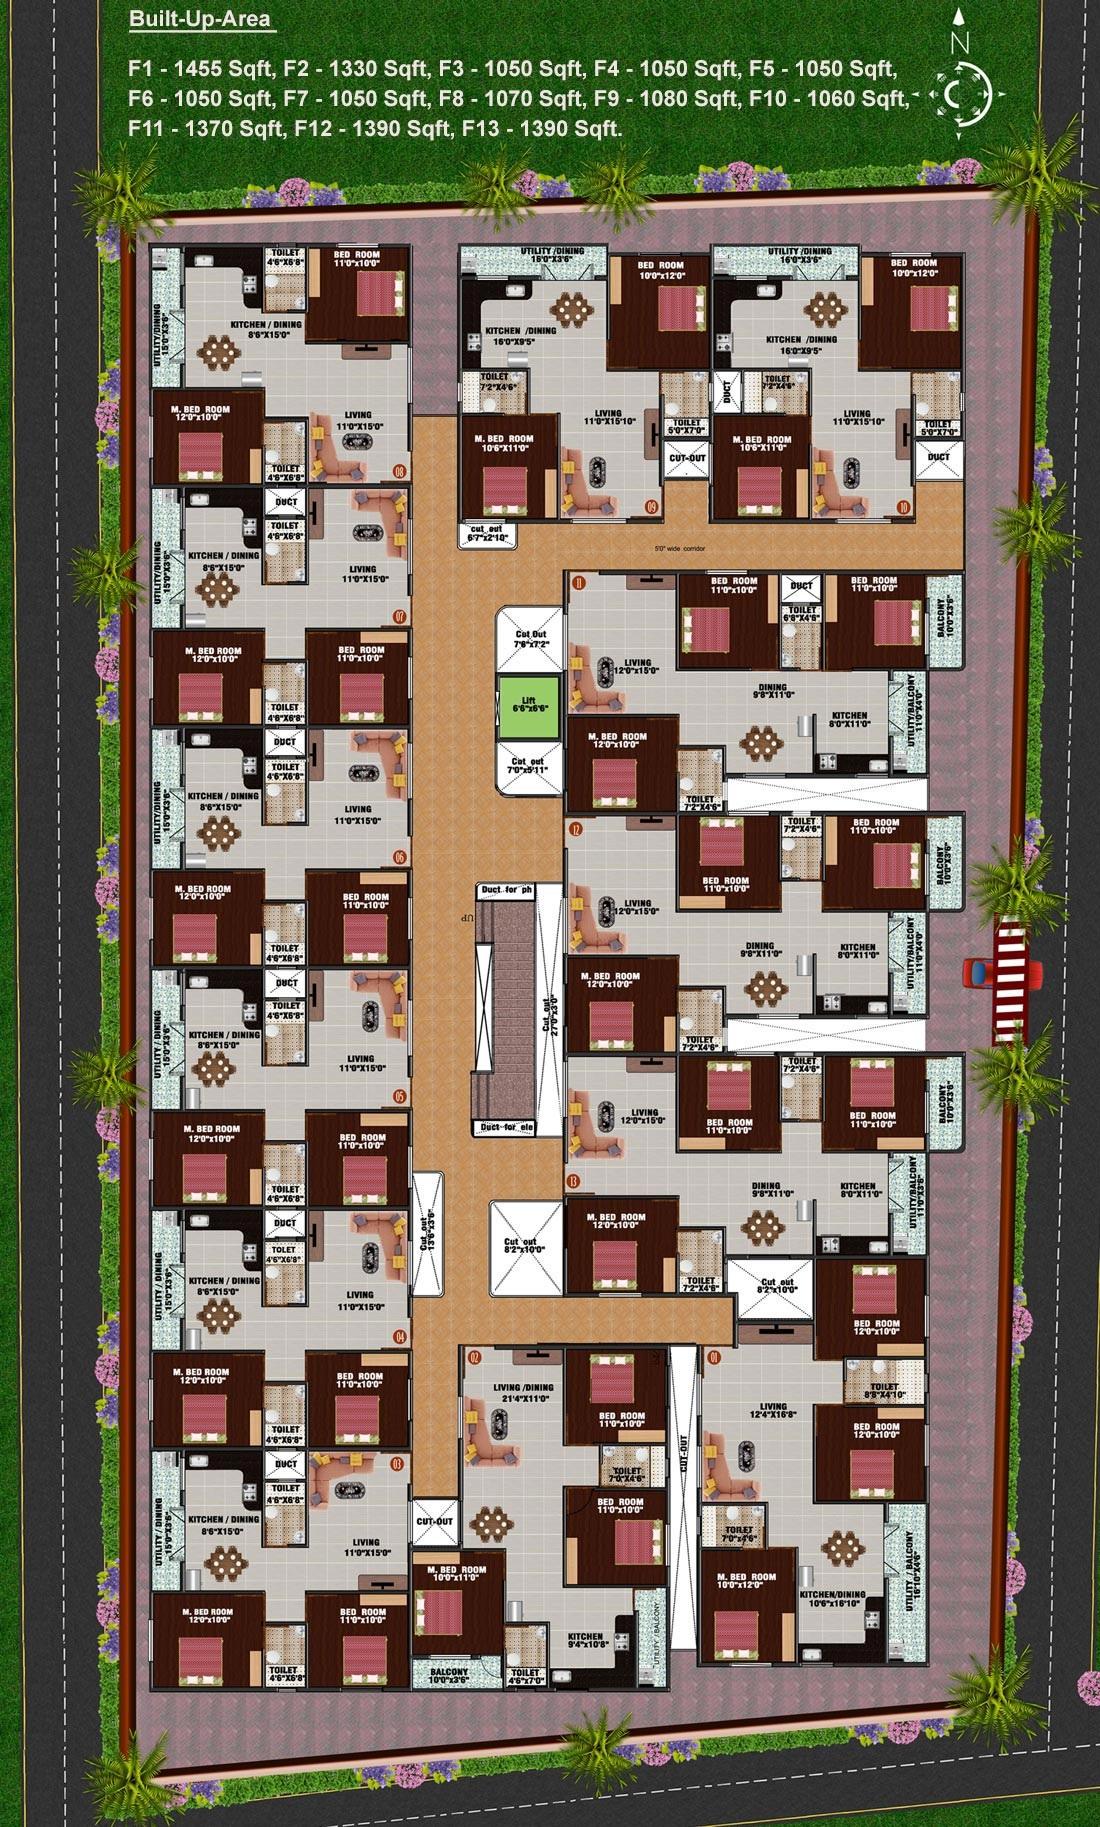 ds max samruddhi master plan image5